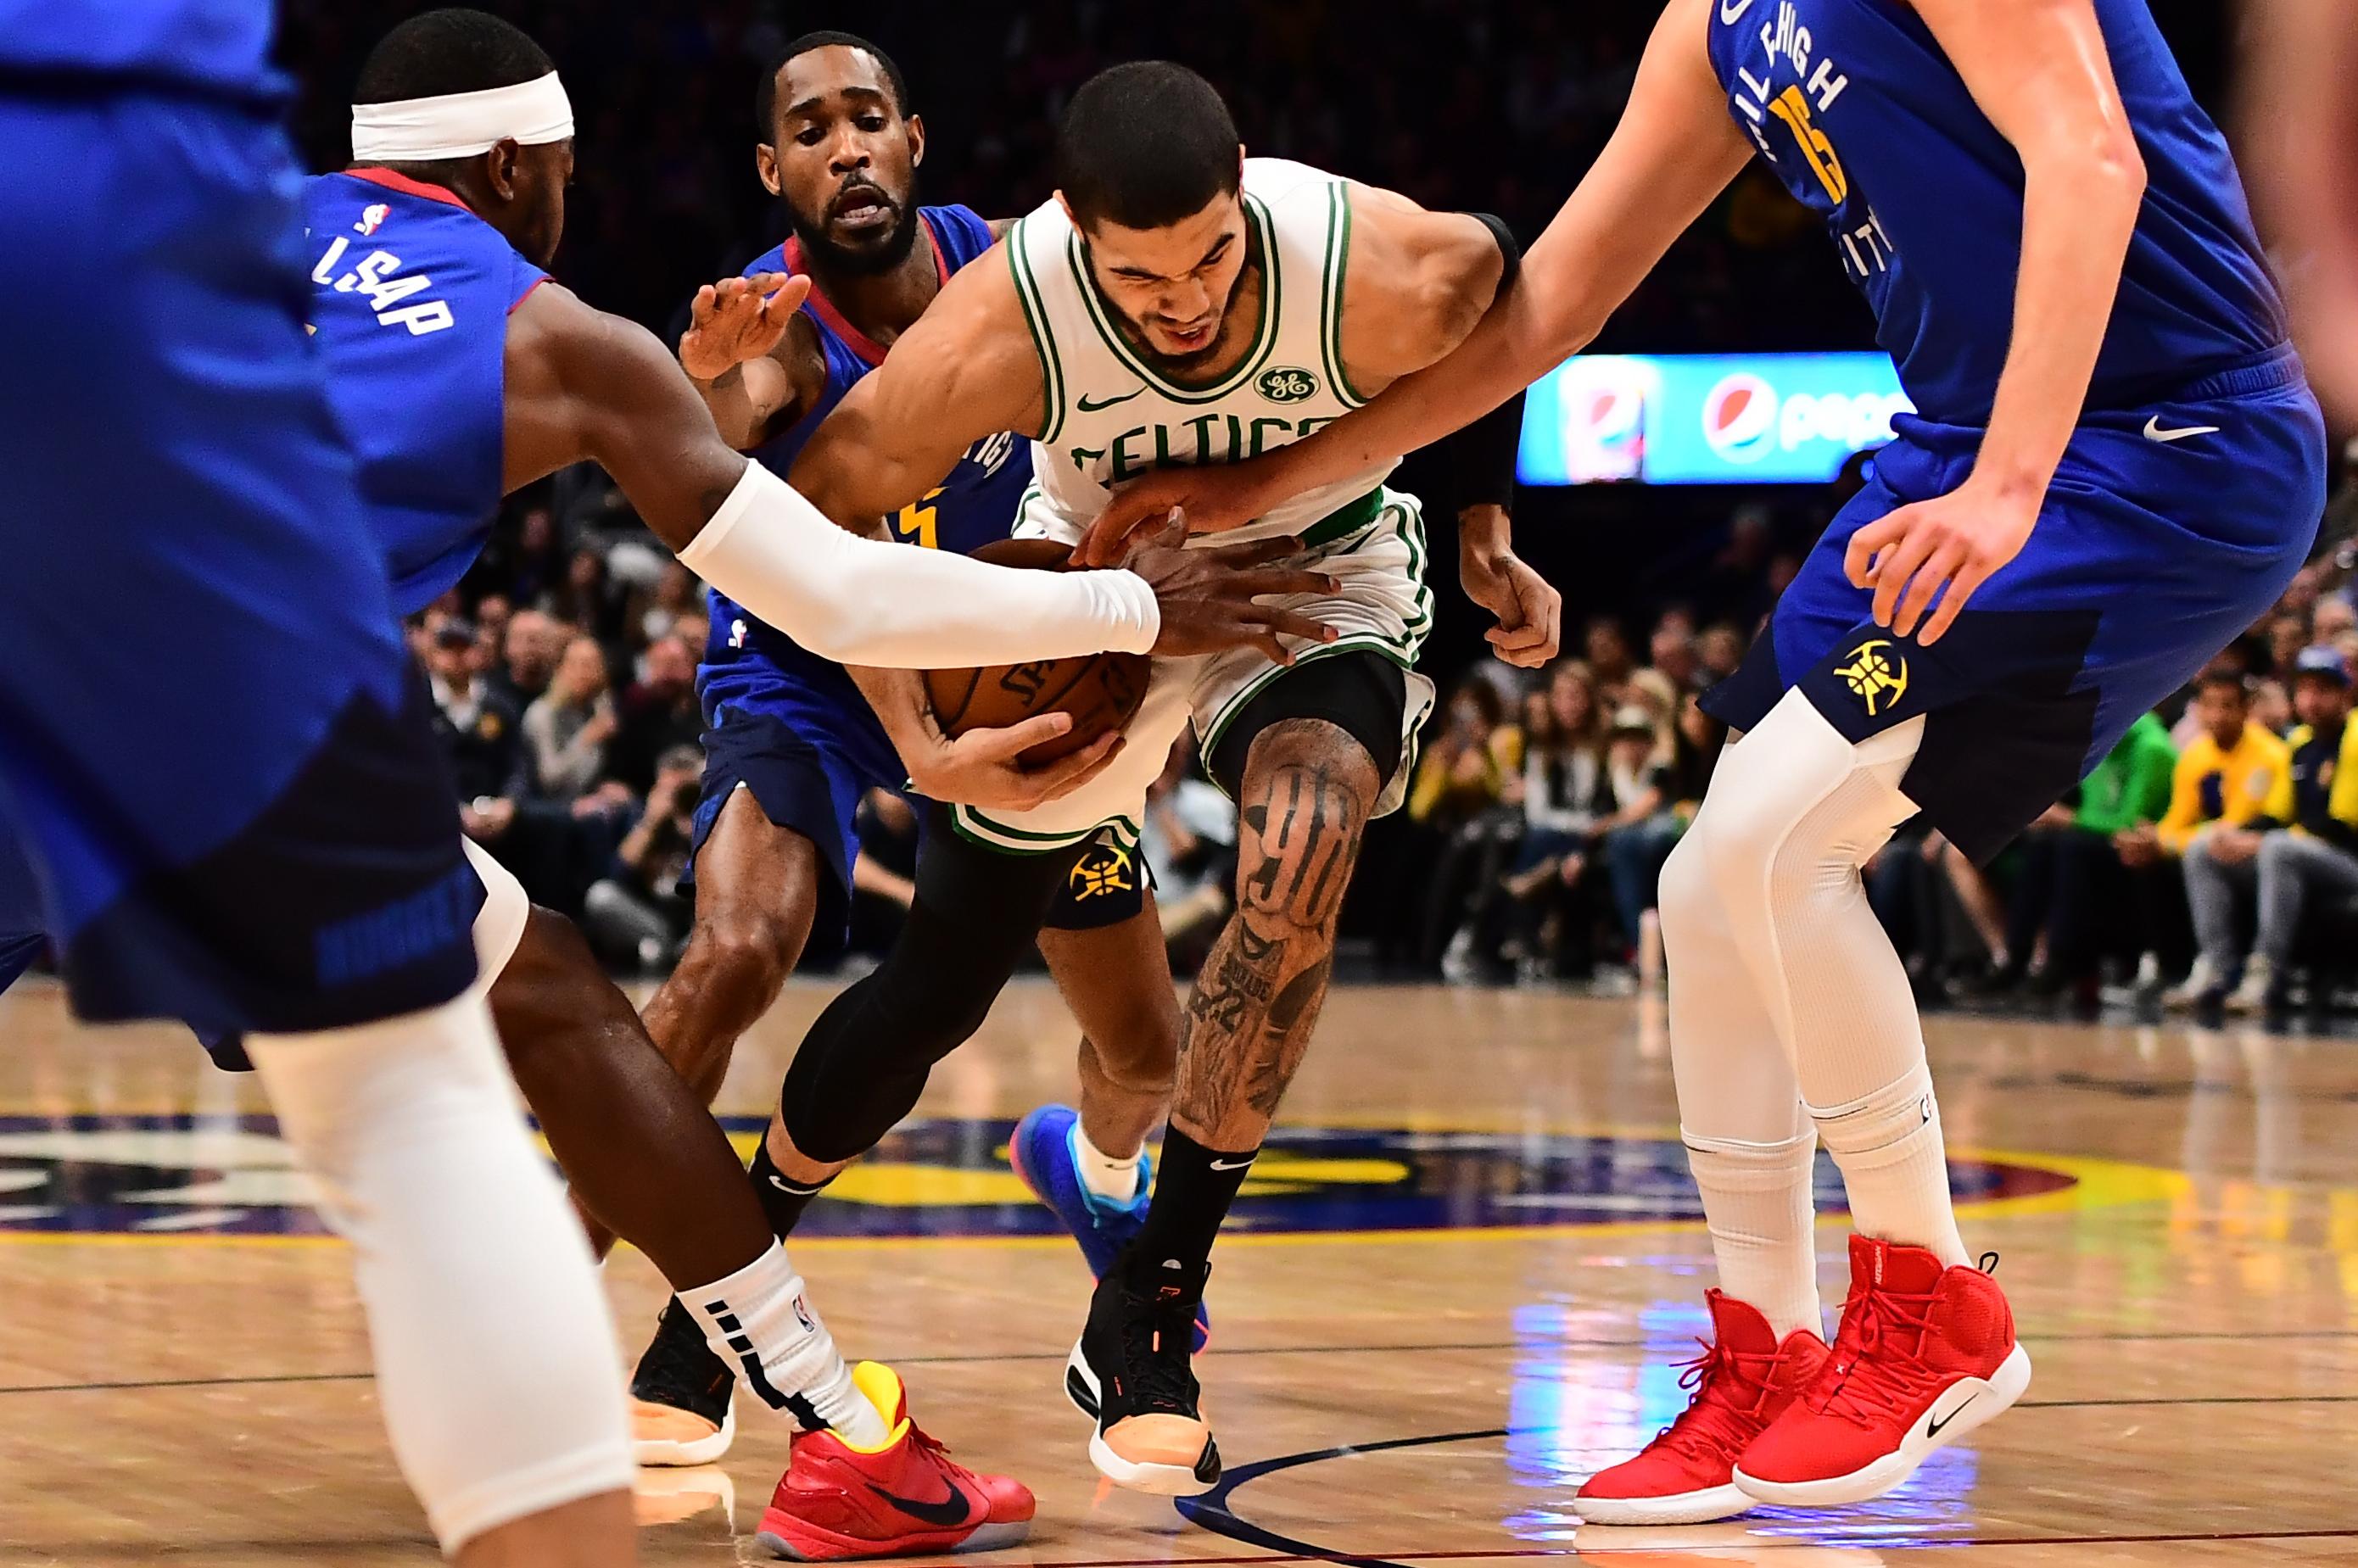 Denver Nuggets forward Paul Millsap (4) and guard Will Barton (5) and center Nikola Jokic (15) reach in on Boston Celtics forward Jayson Tatum (0) in the first quarter at the Pepsi Center.